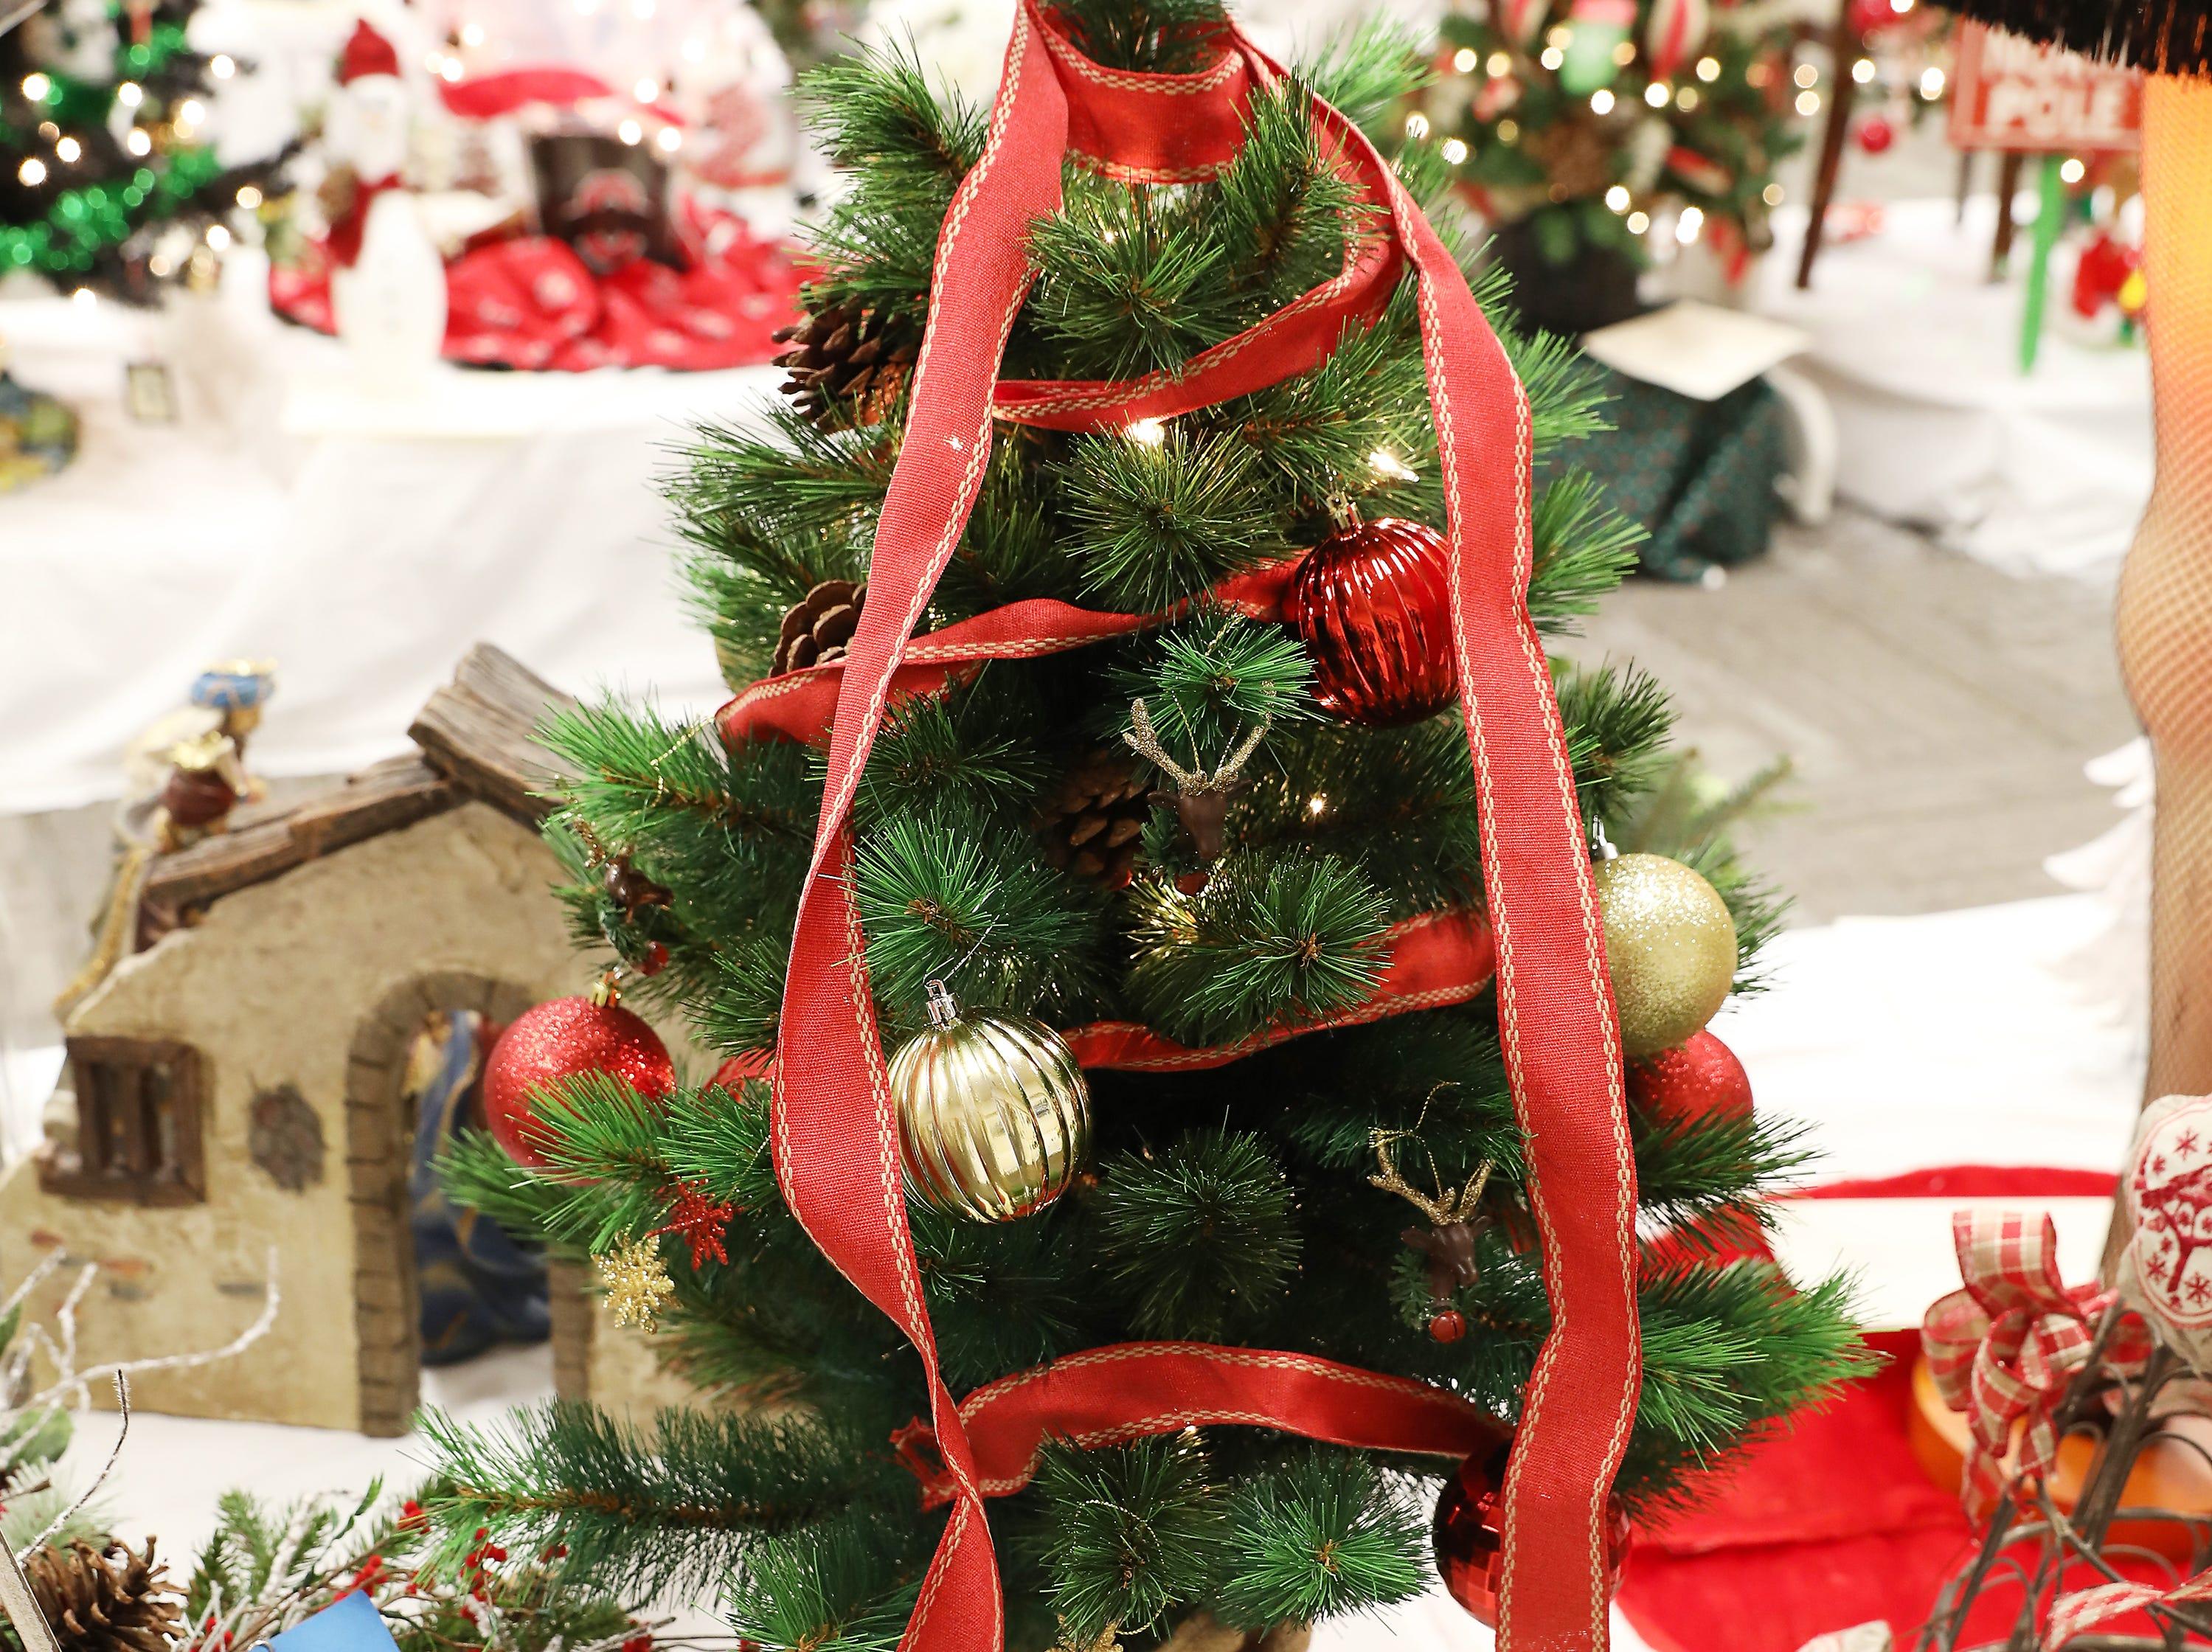 1723:45 PMBi-Con ServicesMini TreeFarmhouse ChristmasA mini tree decorated in a rustic farmhouse theme.$150 gift card to Adornetto's, Giacomo's, Old Market House Inn.